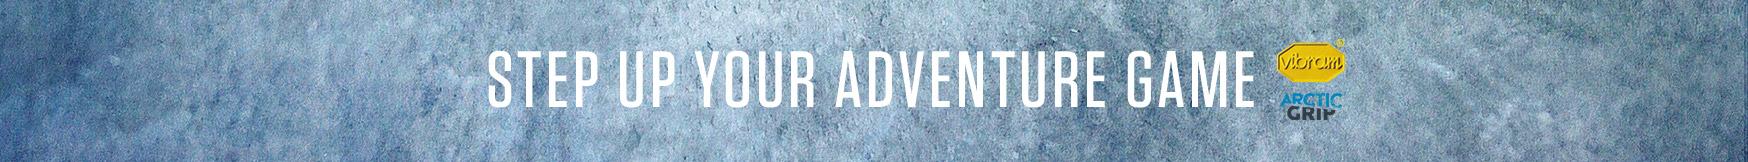 Step Up Your Adventure Game | Vibram | Arctic Grip